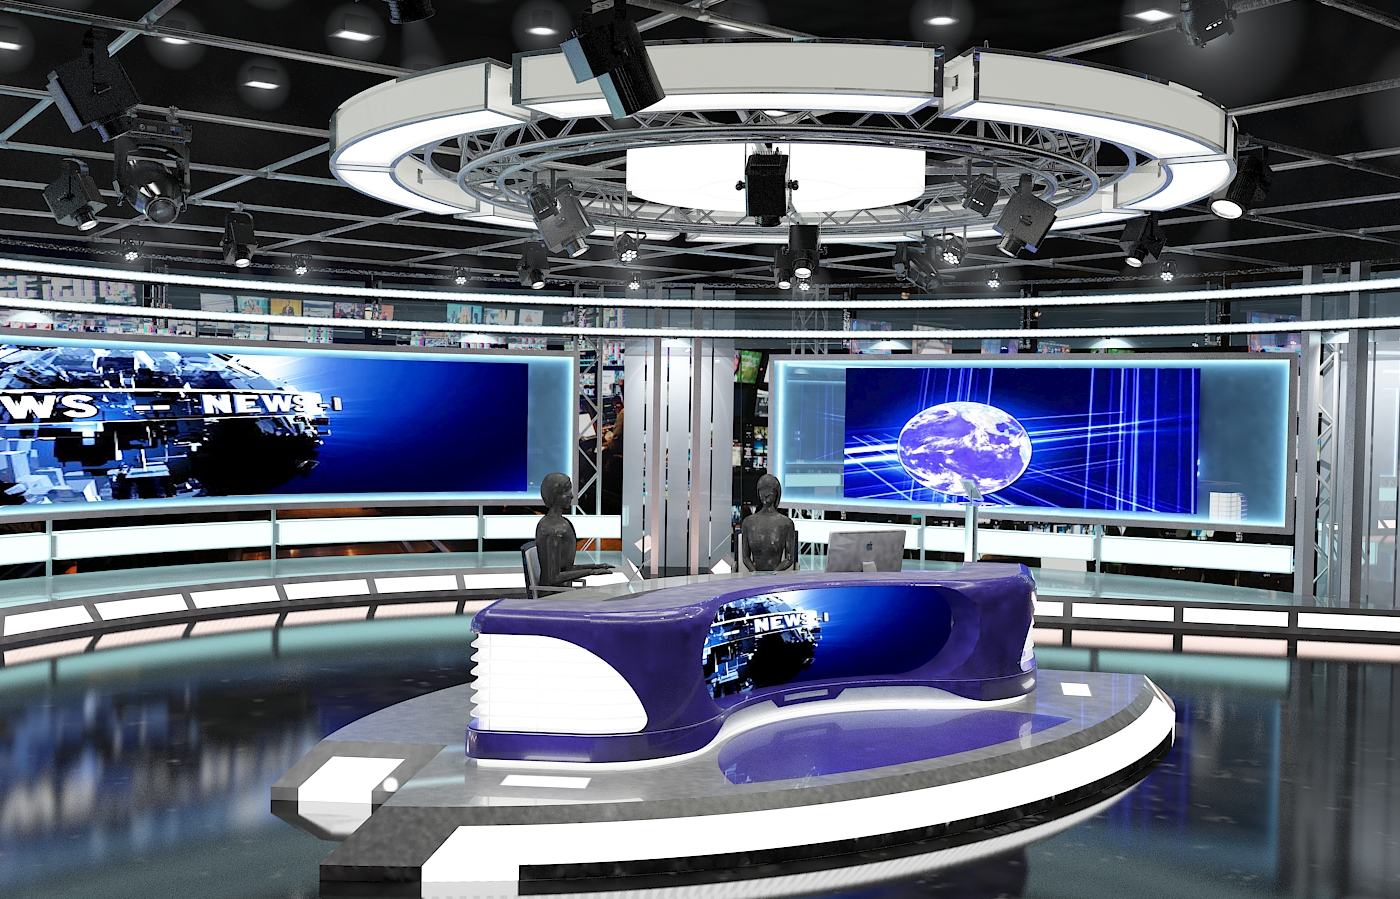 виртуал телевизийн студи цуглуулга vol 6 3d загвар max dxf dwg fbx obj 223369